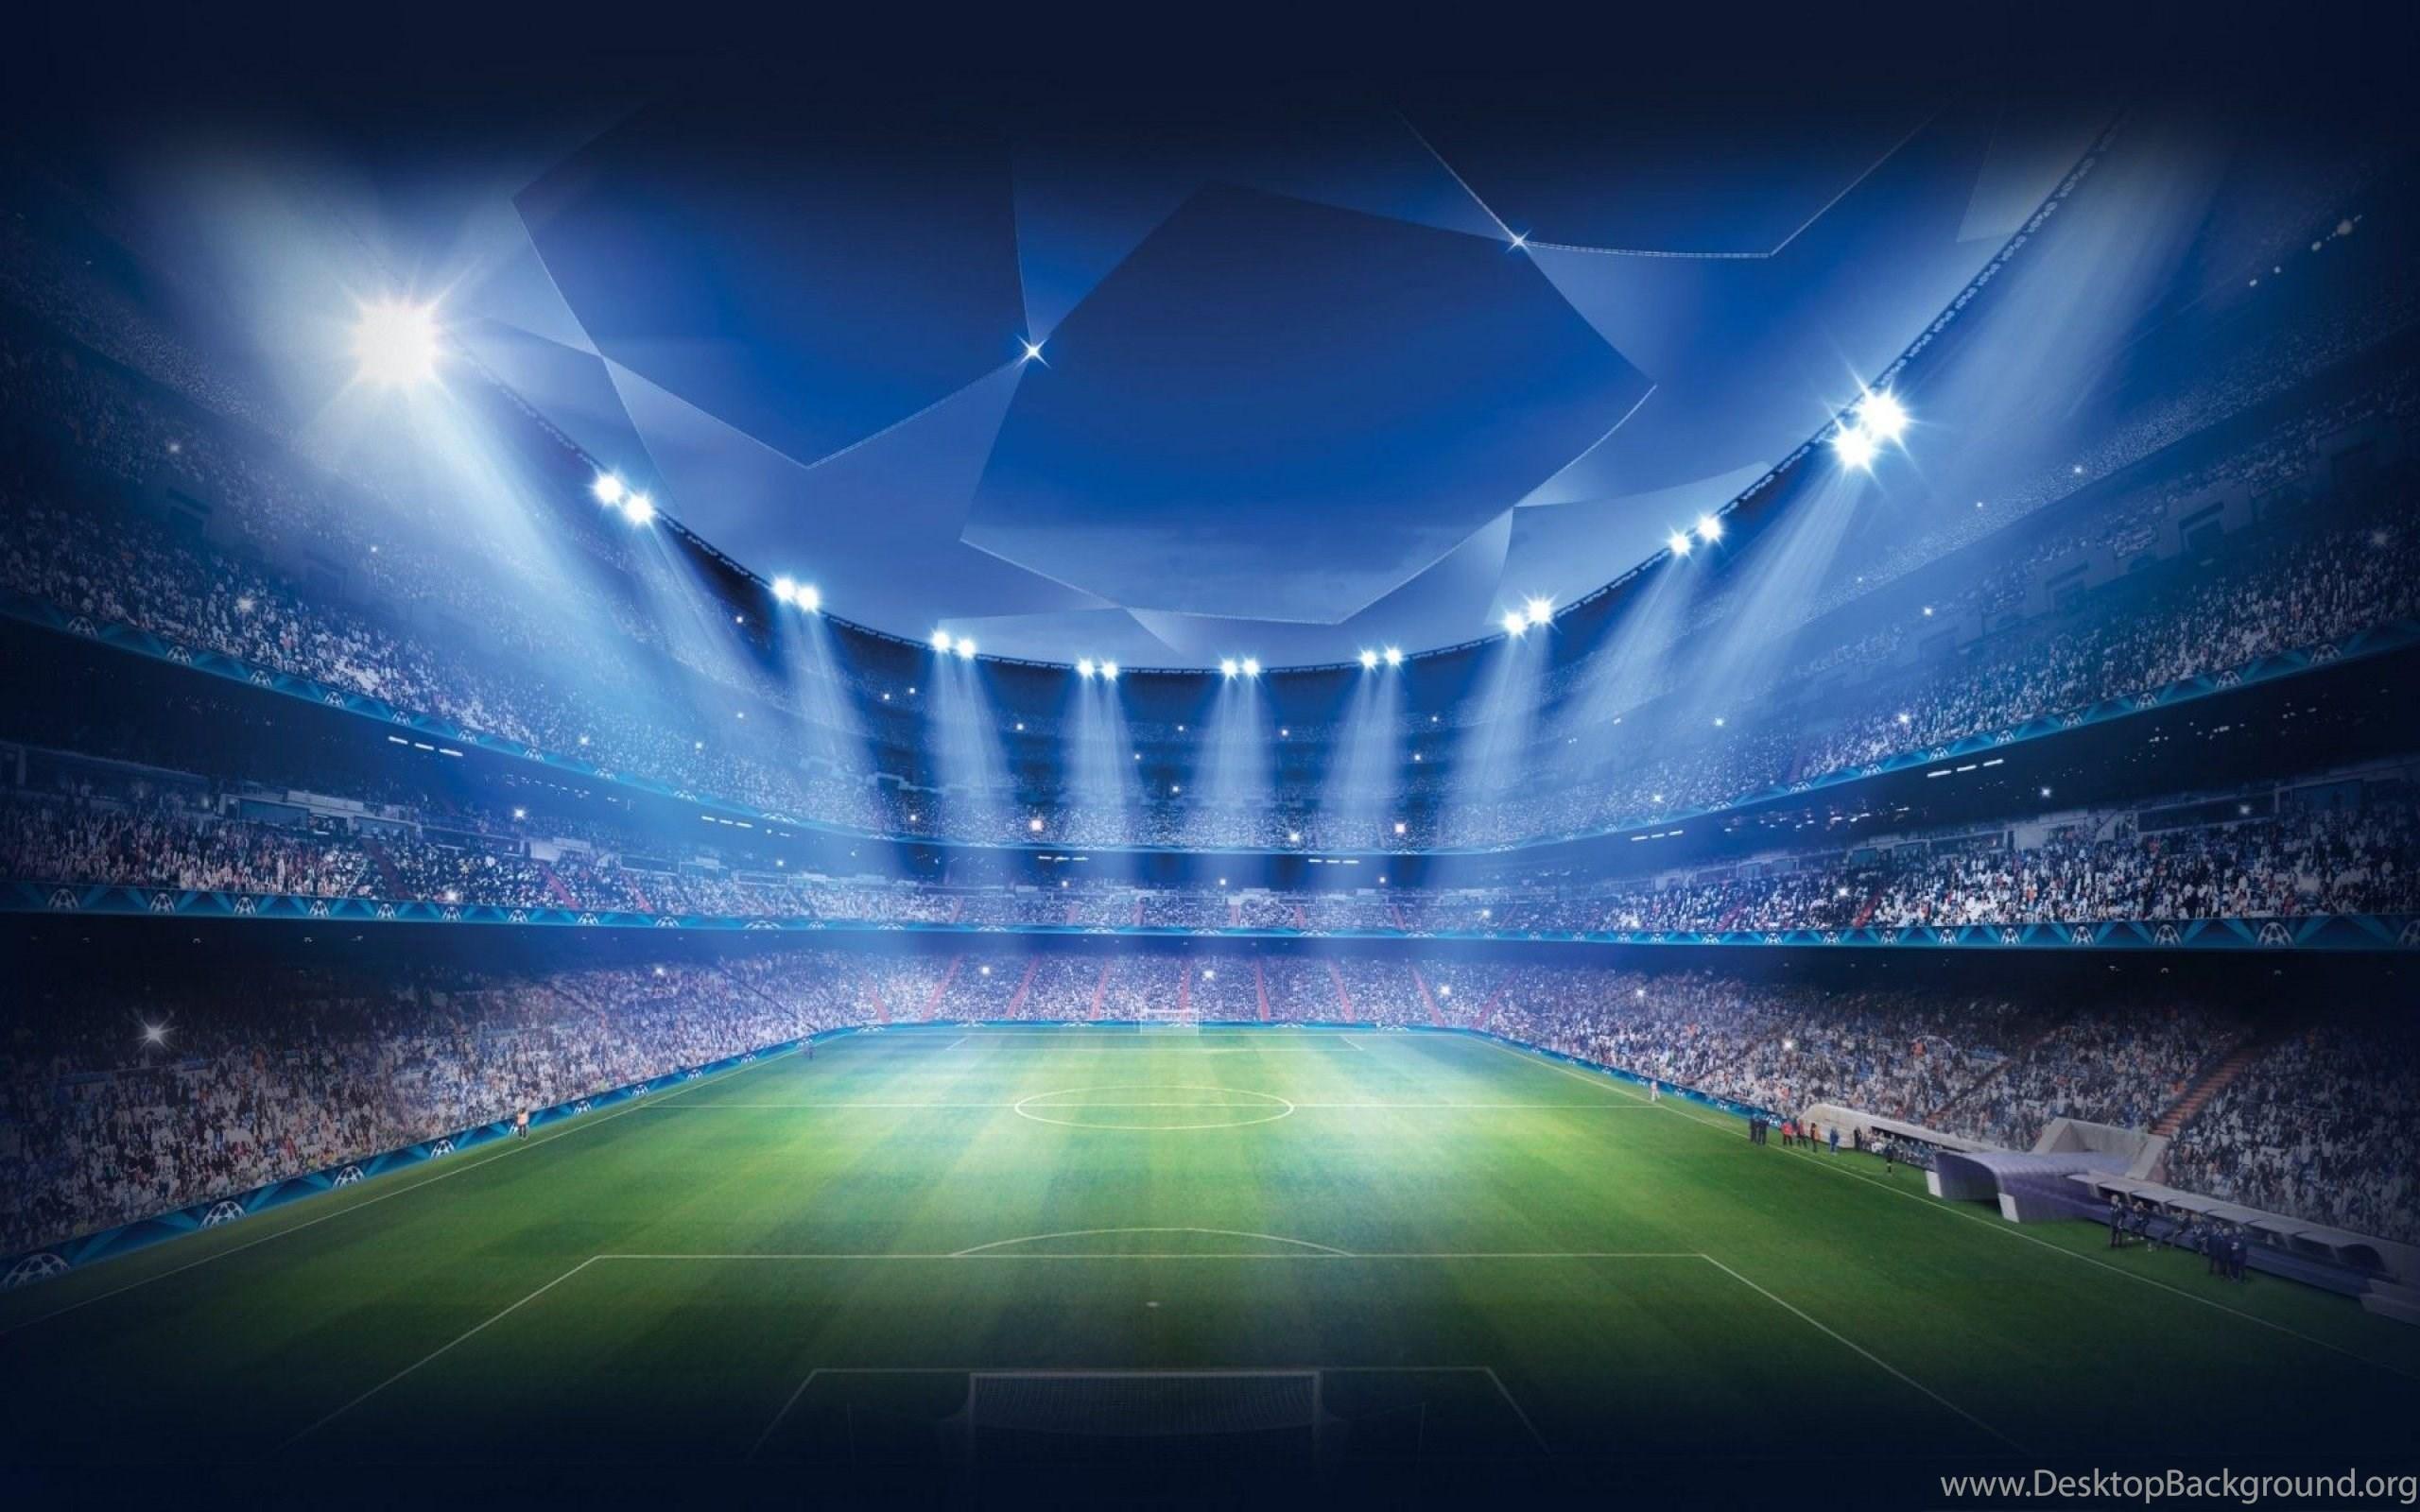 Football stadium soccer pitch wallpapers hd for desktop desktop background - Soccer stadium hd ...